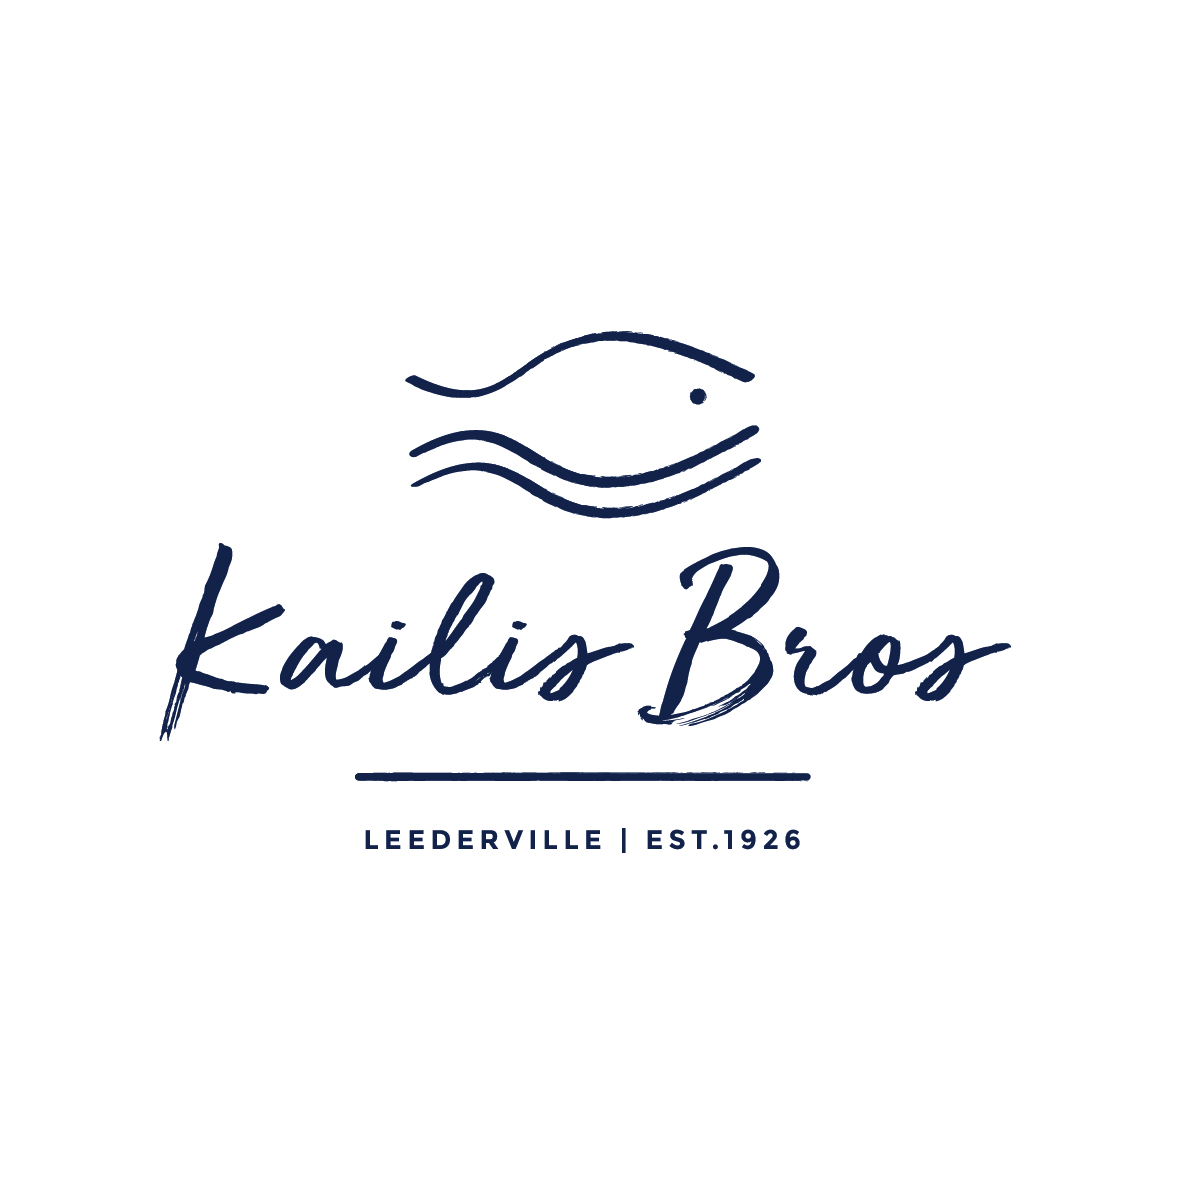 Kailis logo white background.jpg